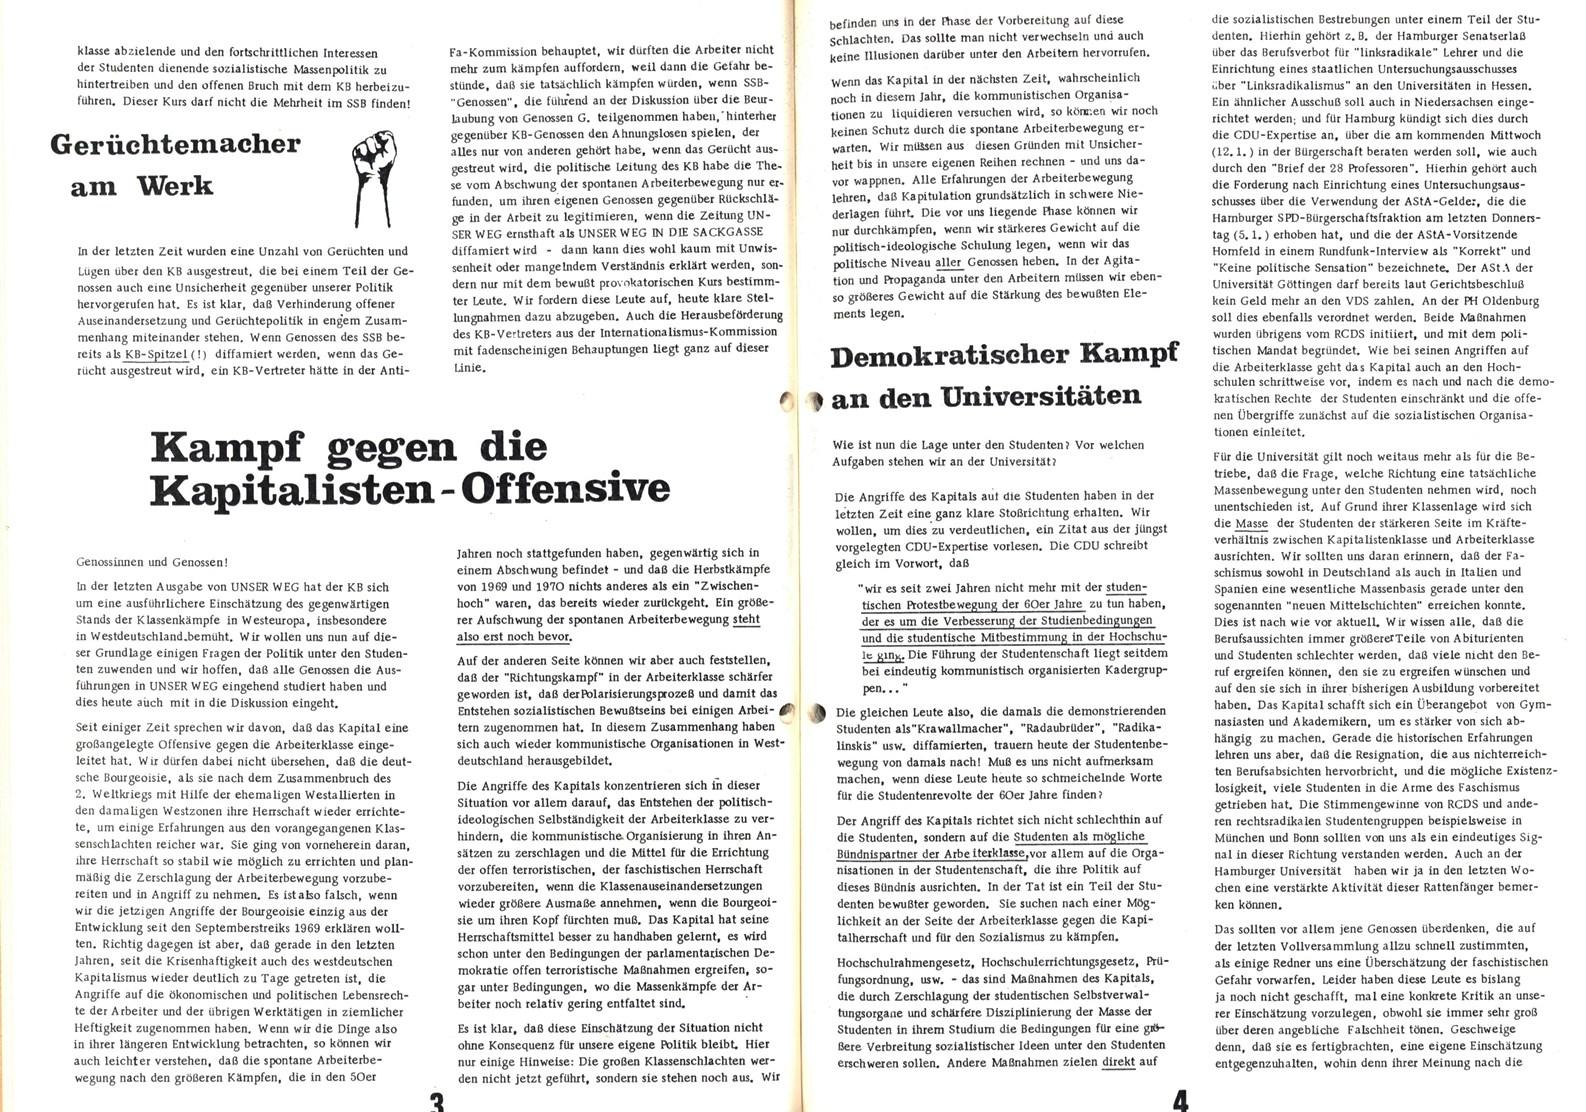 KB_Unser_Weg_19720100_Sonder_03